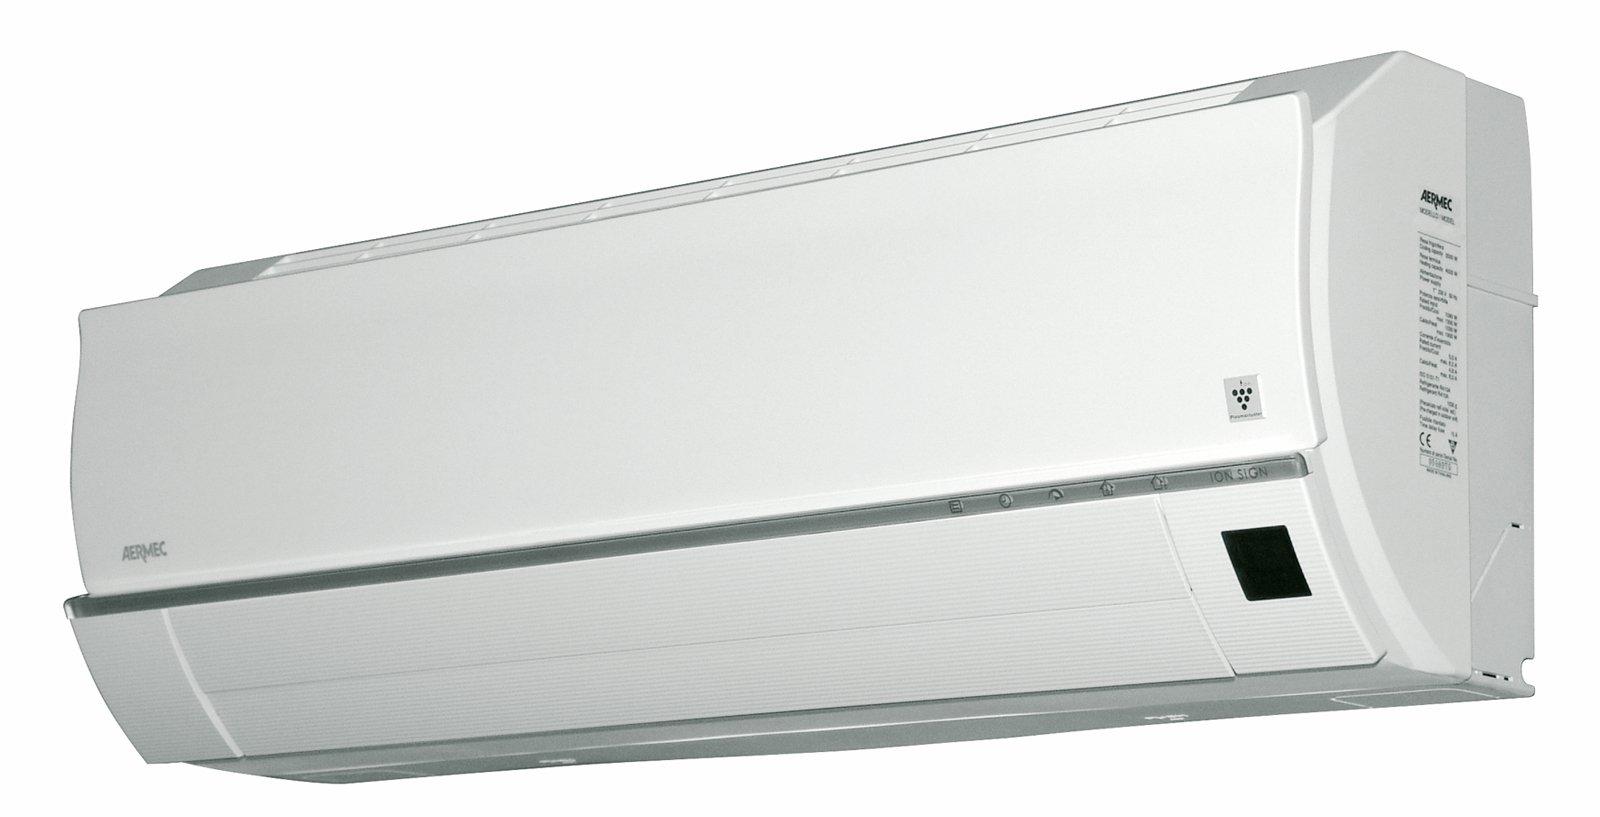 ONLY IN Pompa di calore DC Inverter senza unità esterna - Termal